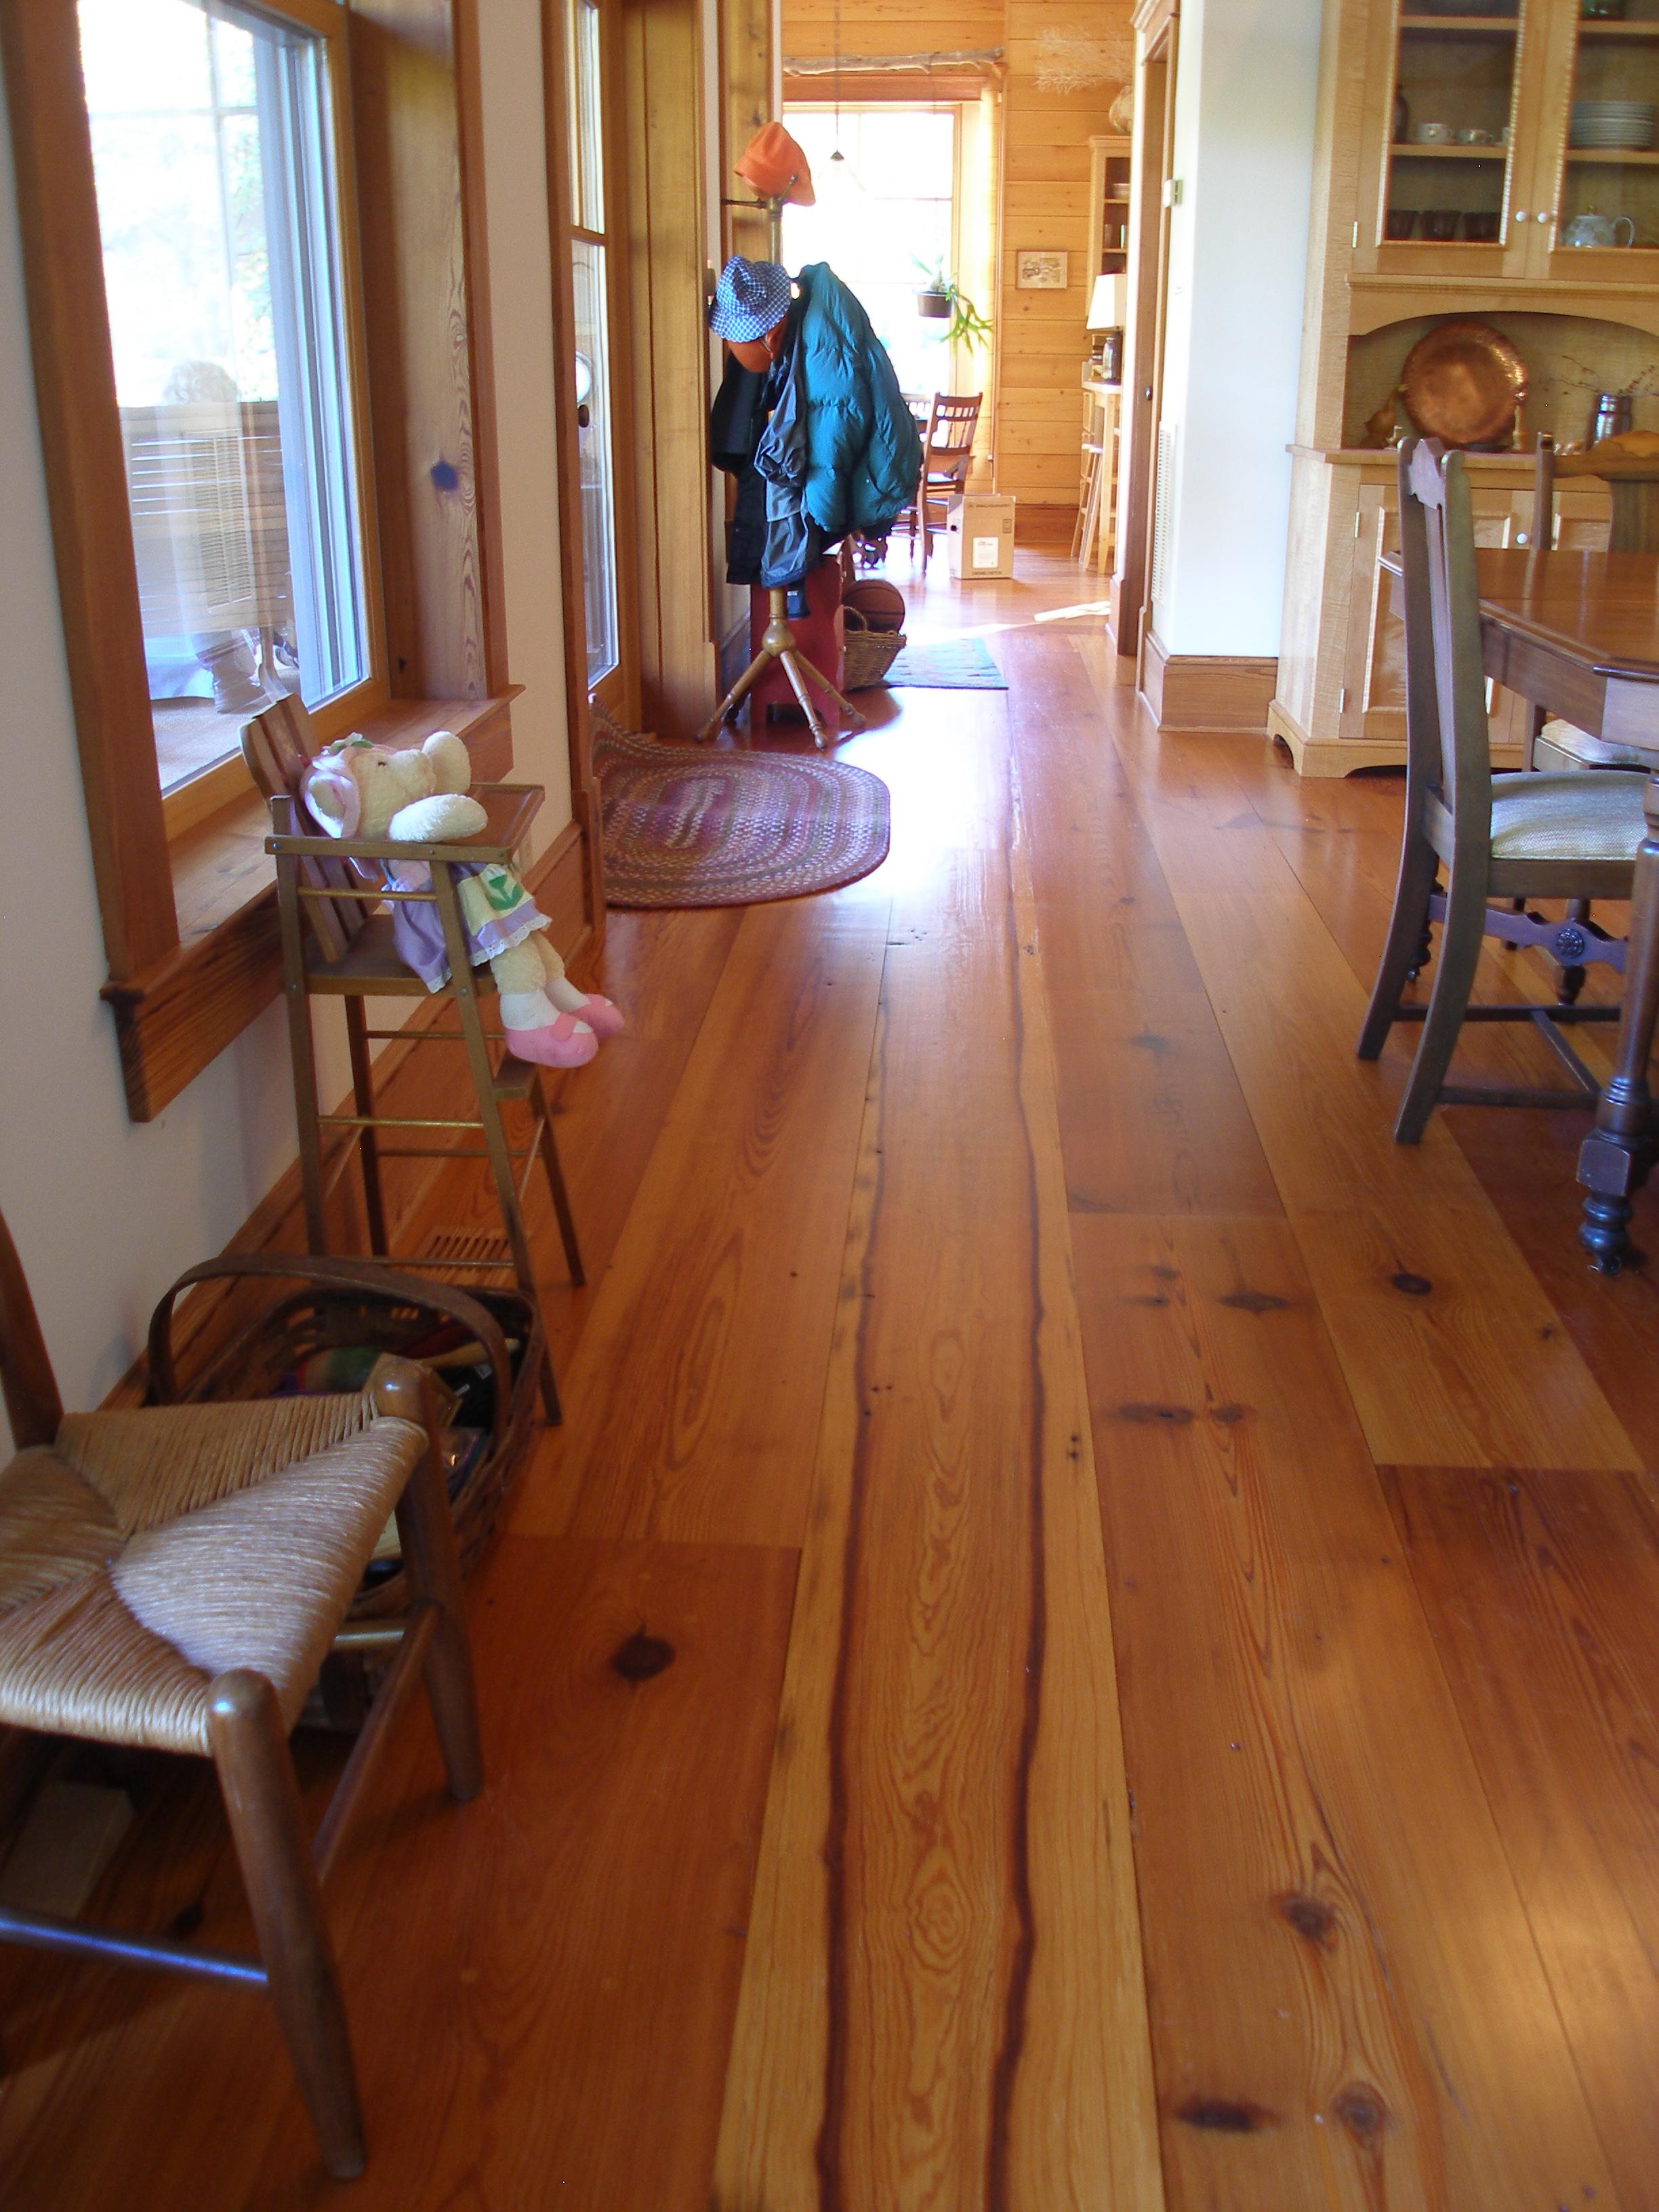 Special figure in wide heart pine floor boards.